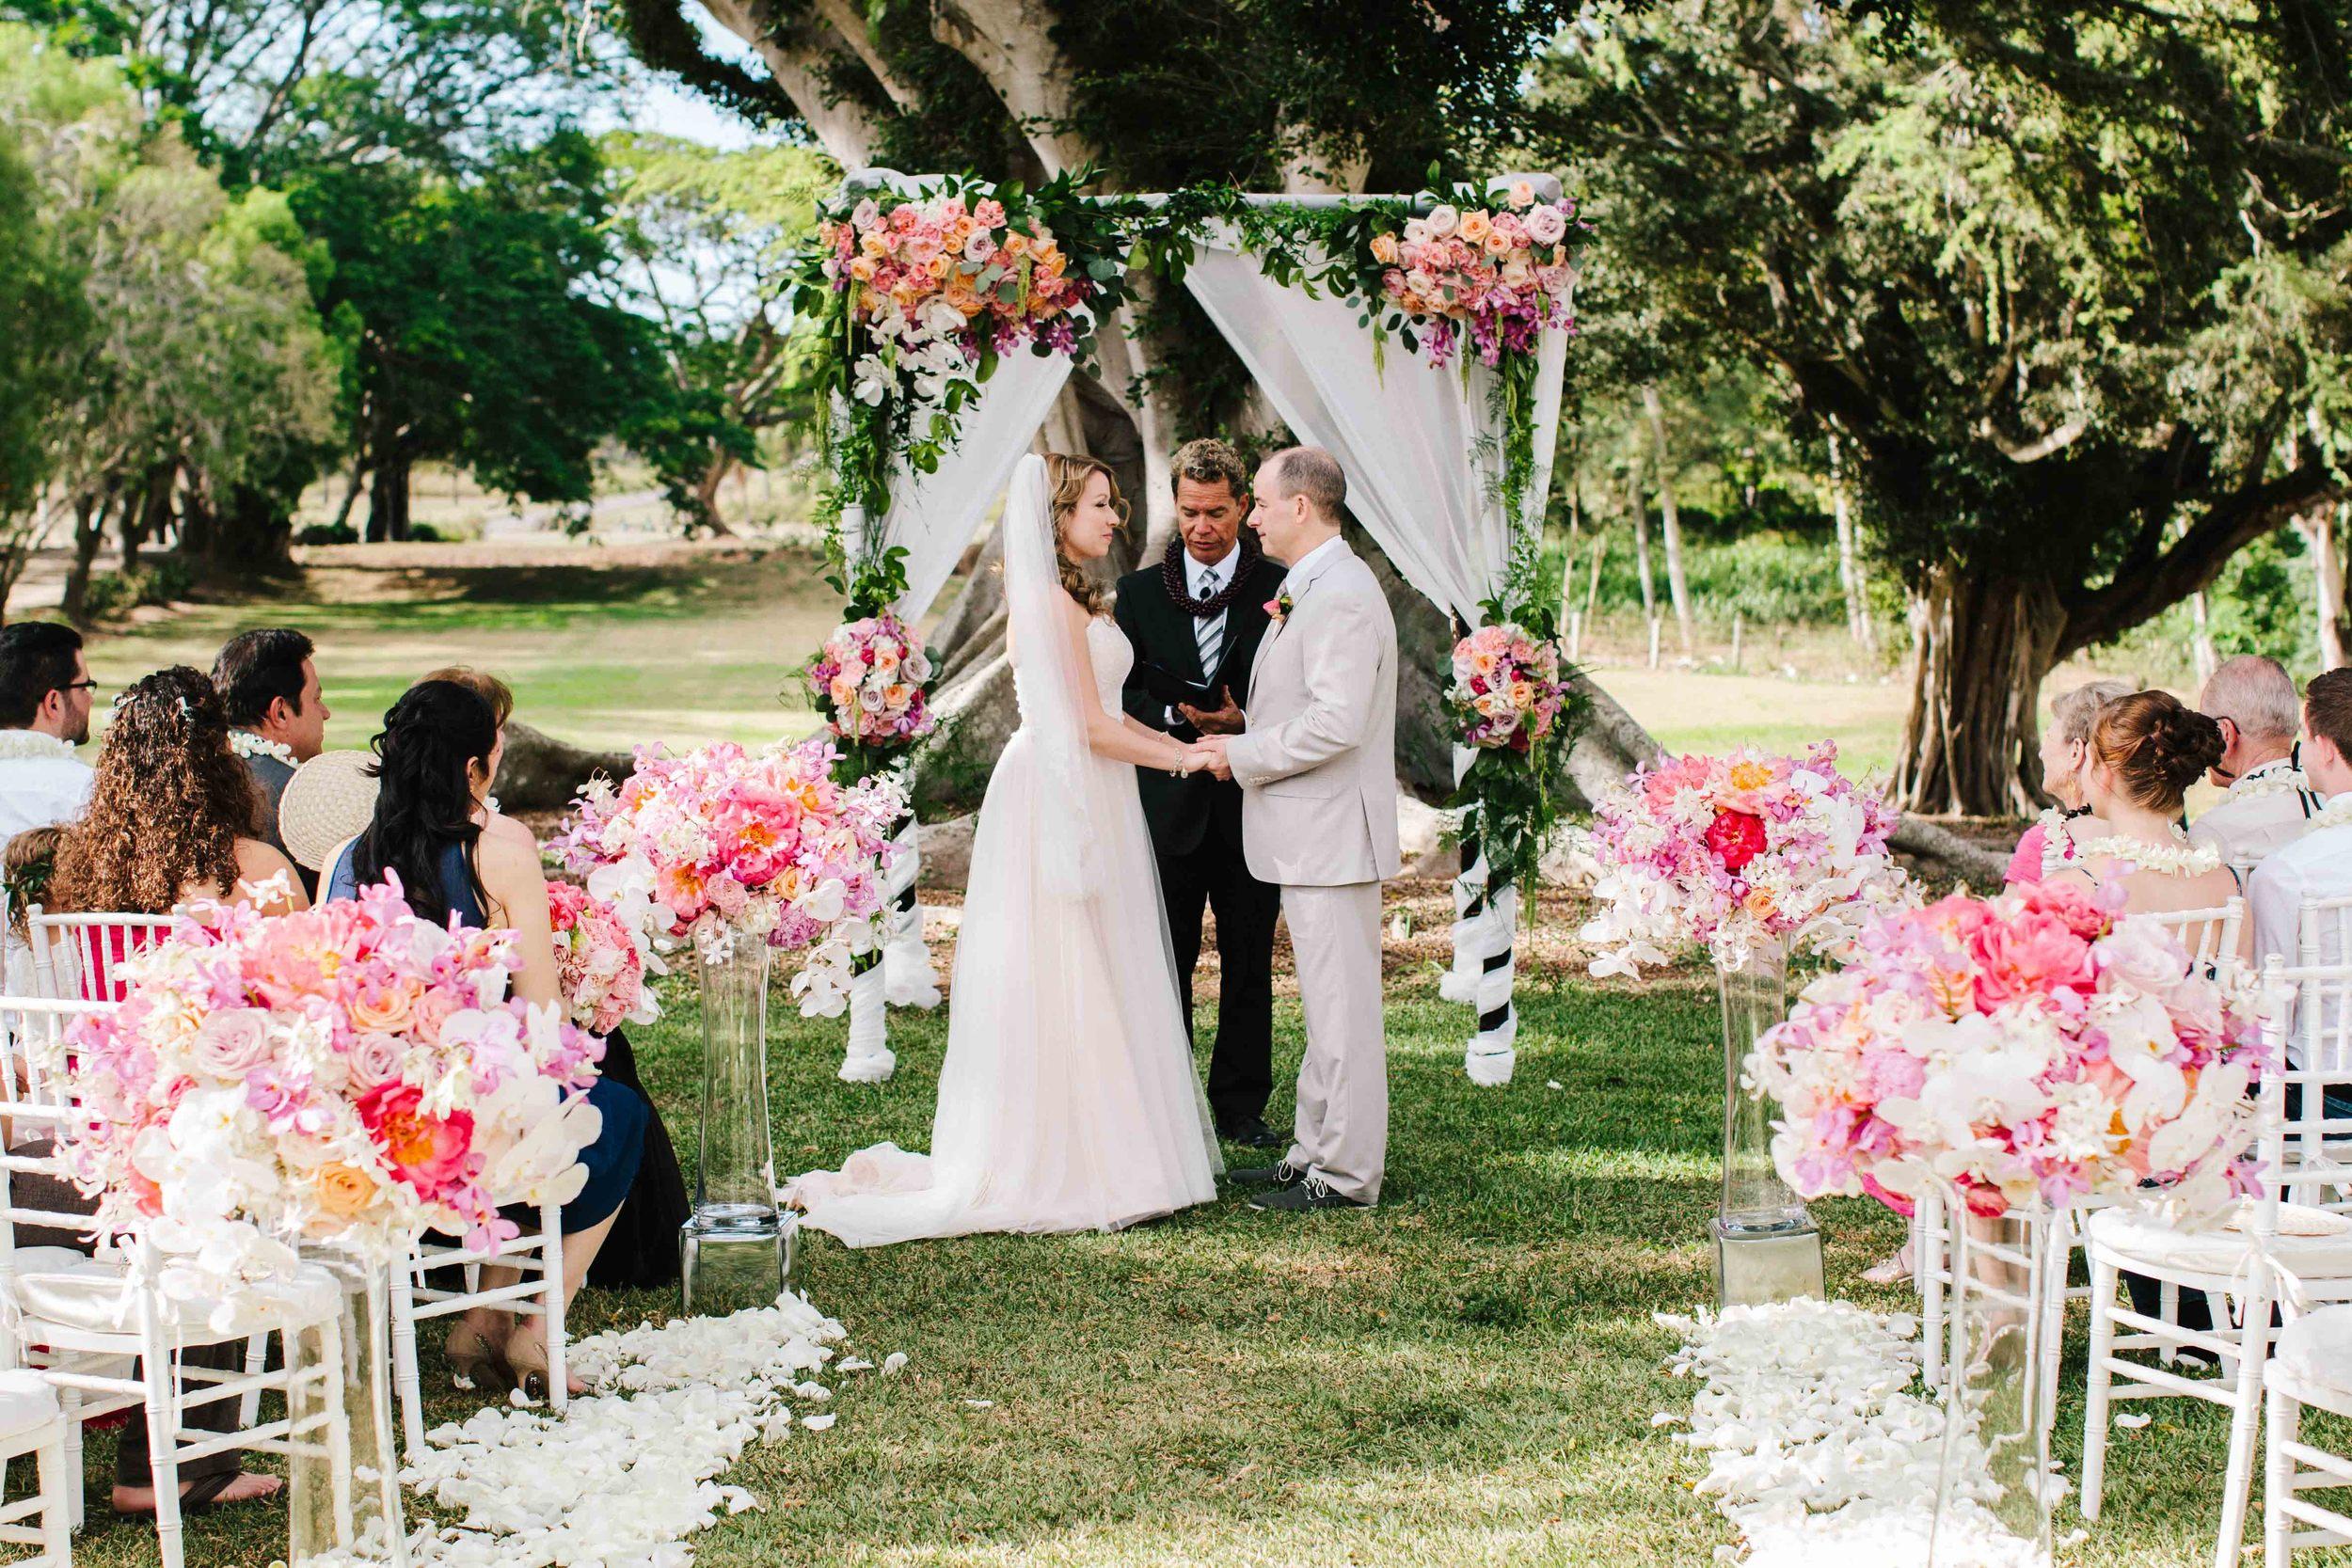 Wedding Ceremony at Dillingham Ranch